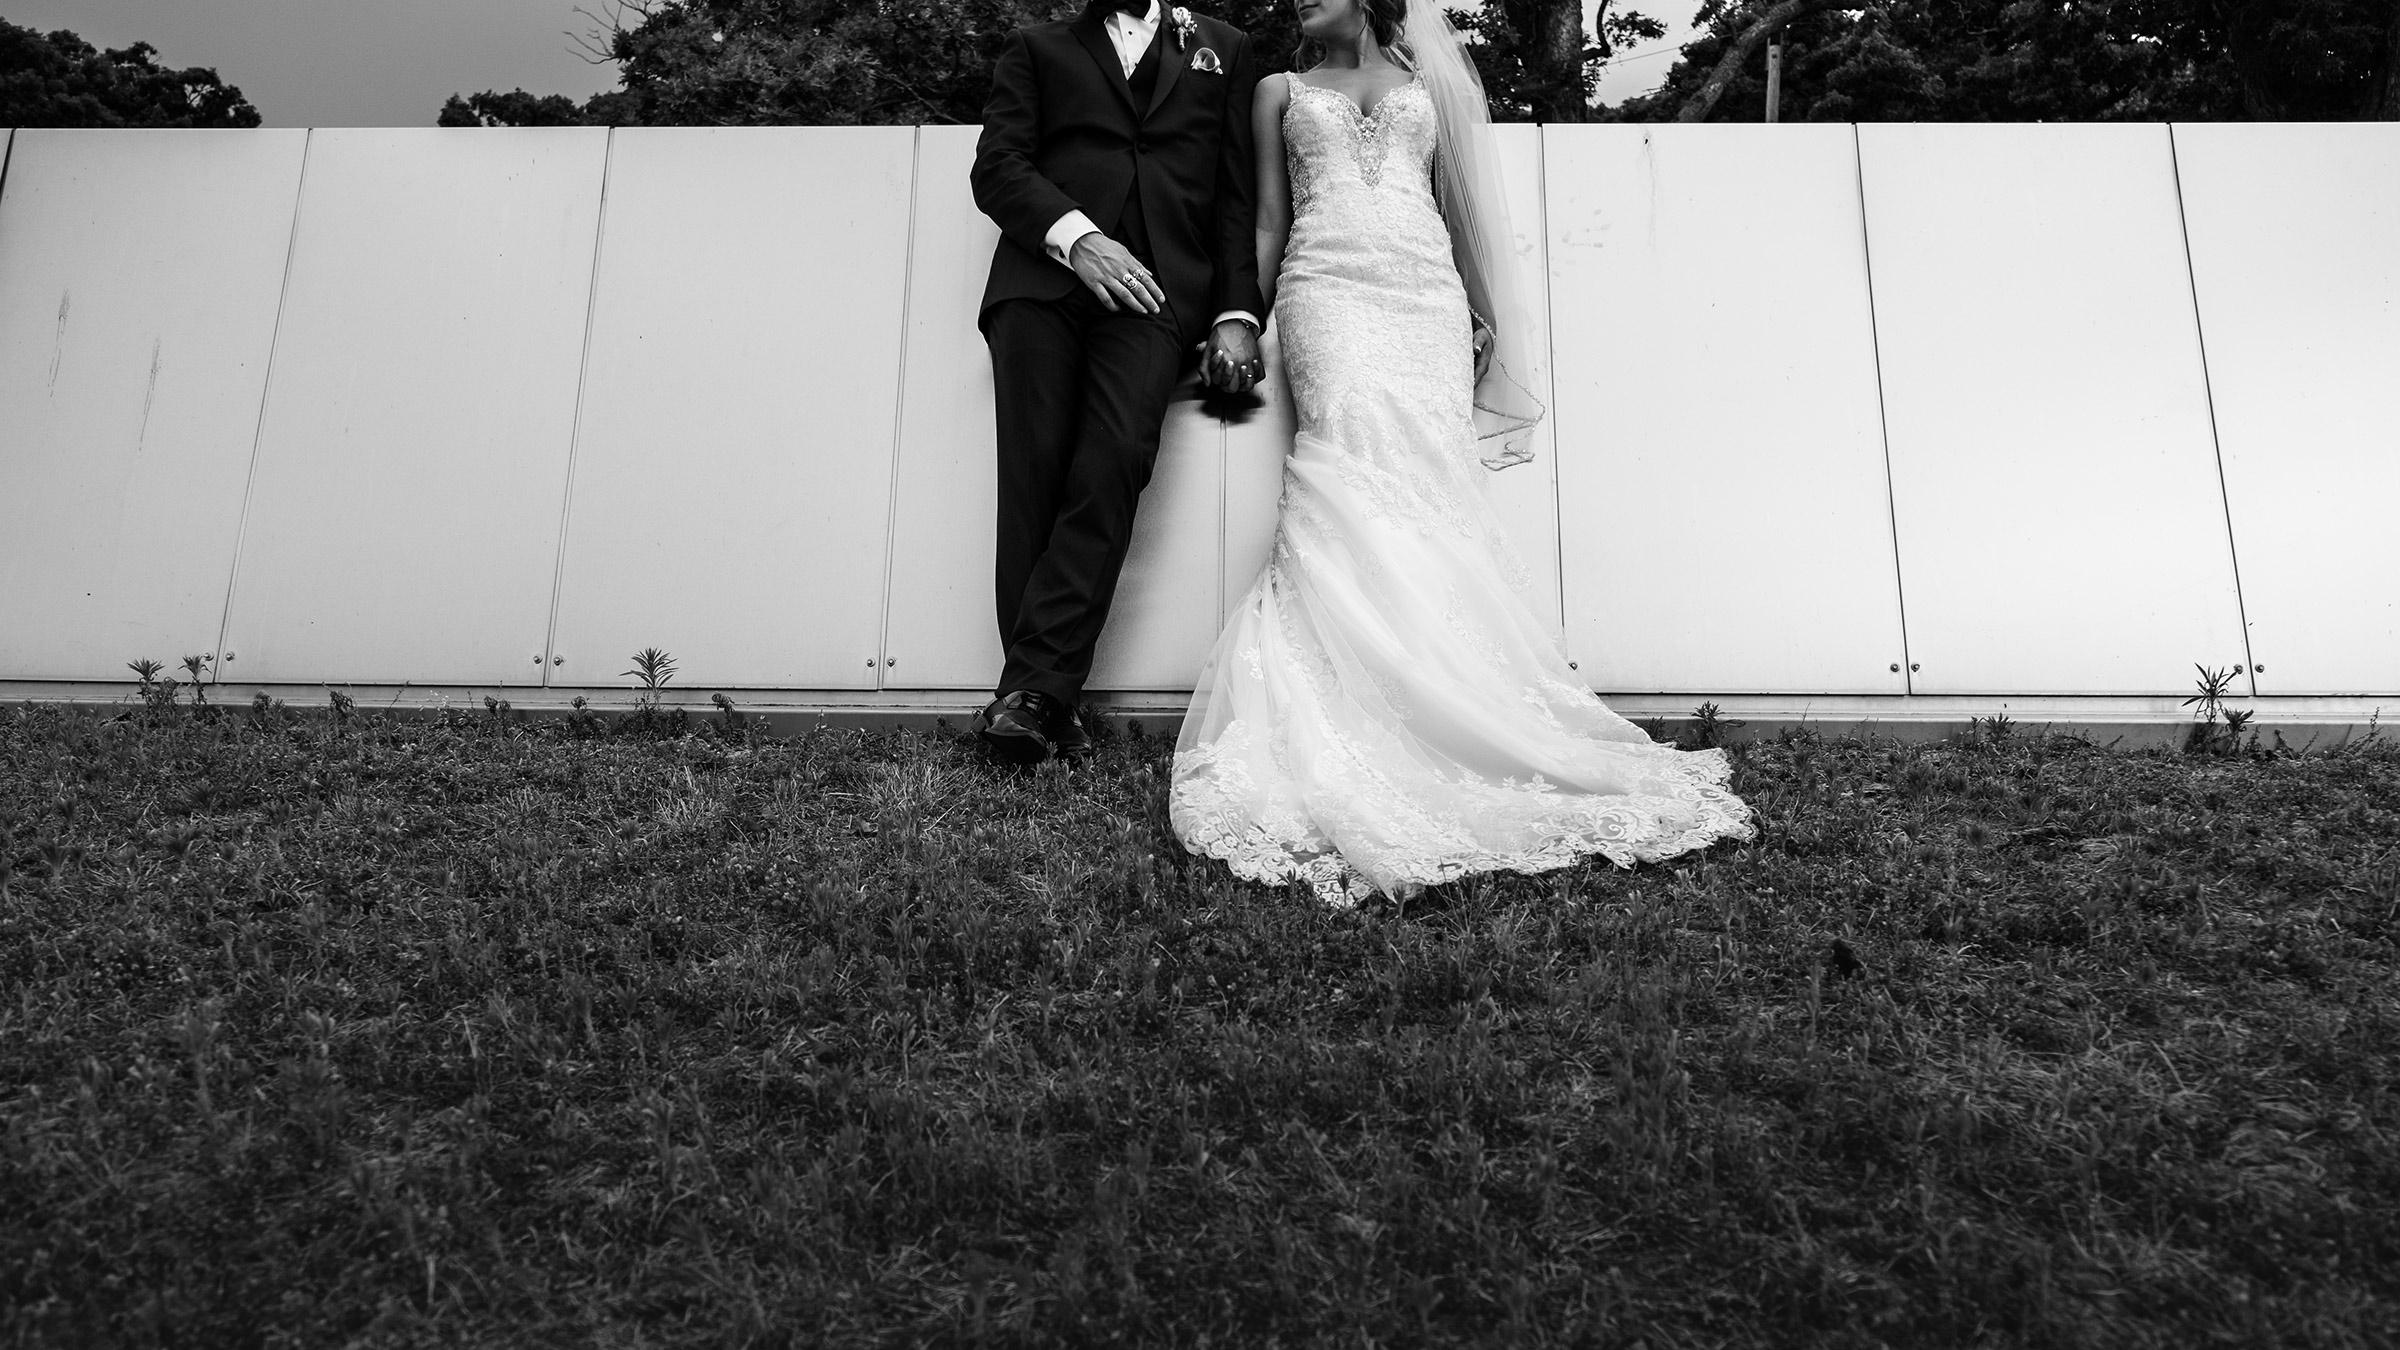 bride-groom-holding-hands-no-heads-desmoines-iowa-art-center-raelyn-ramey-photography.jpg